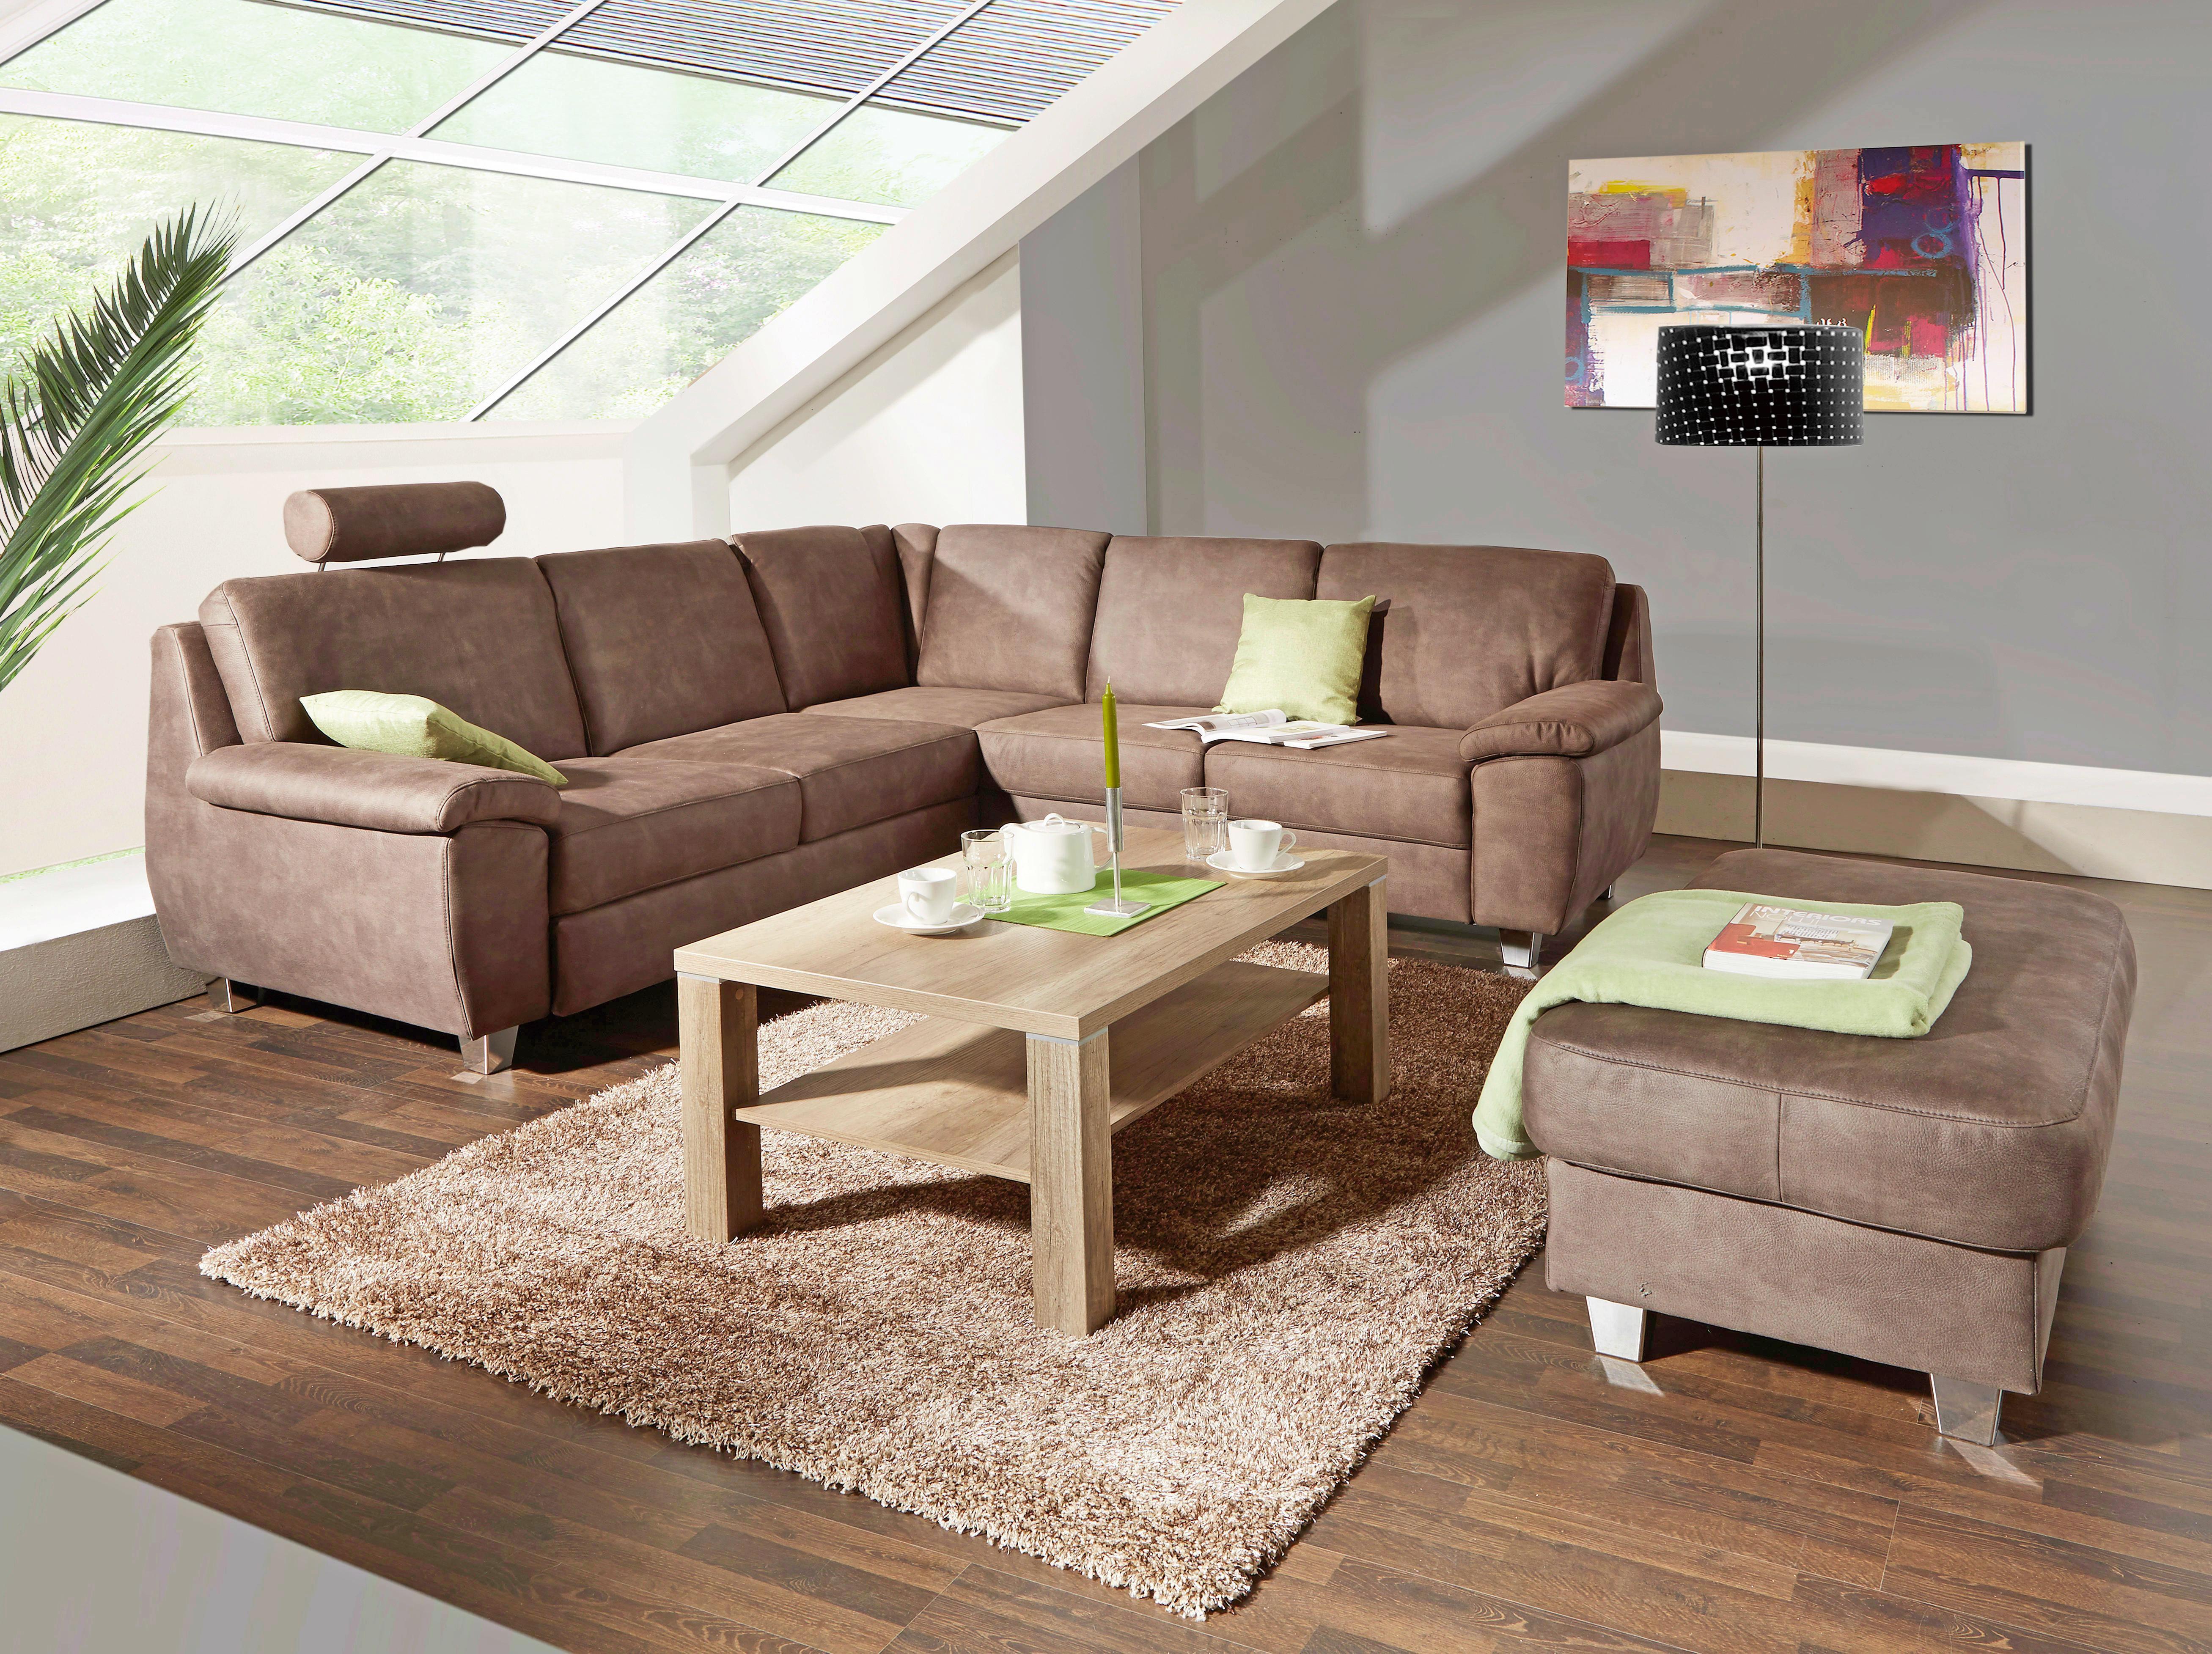 Ülőke Moskau - barna/szürke, modern, textil (128/48/65cm)